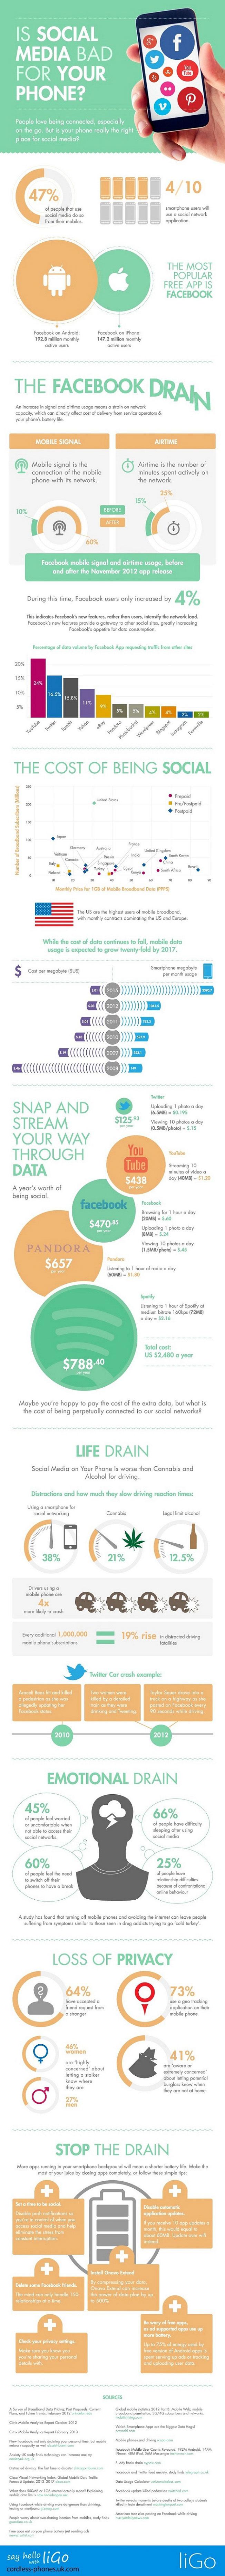 Social Mobile Risks-Infographic